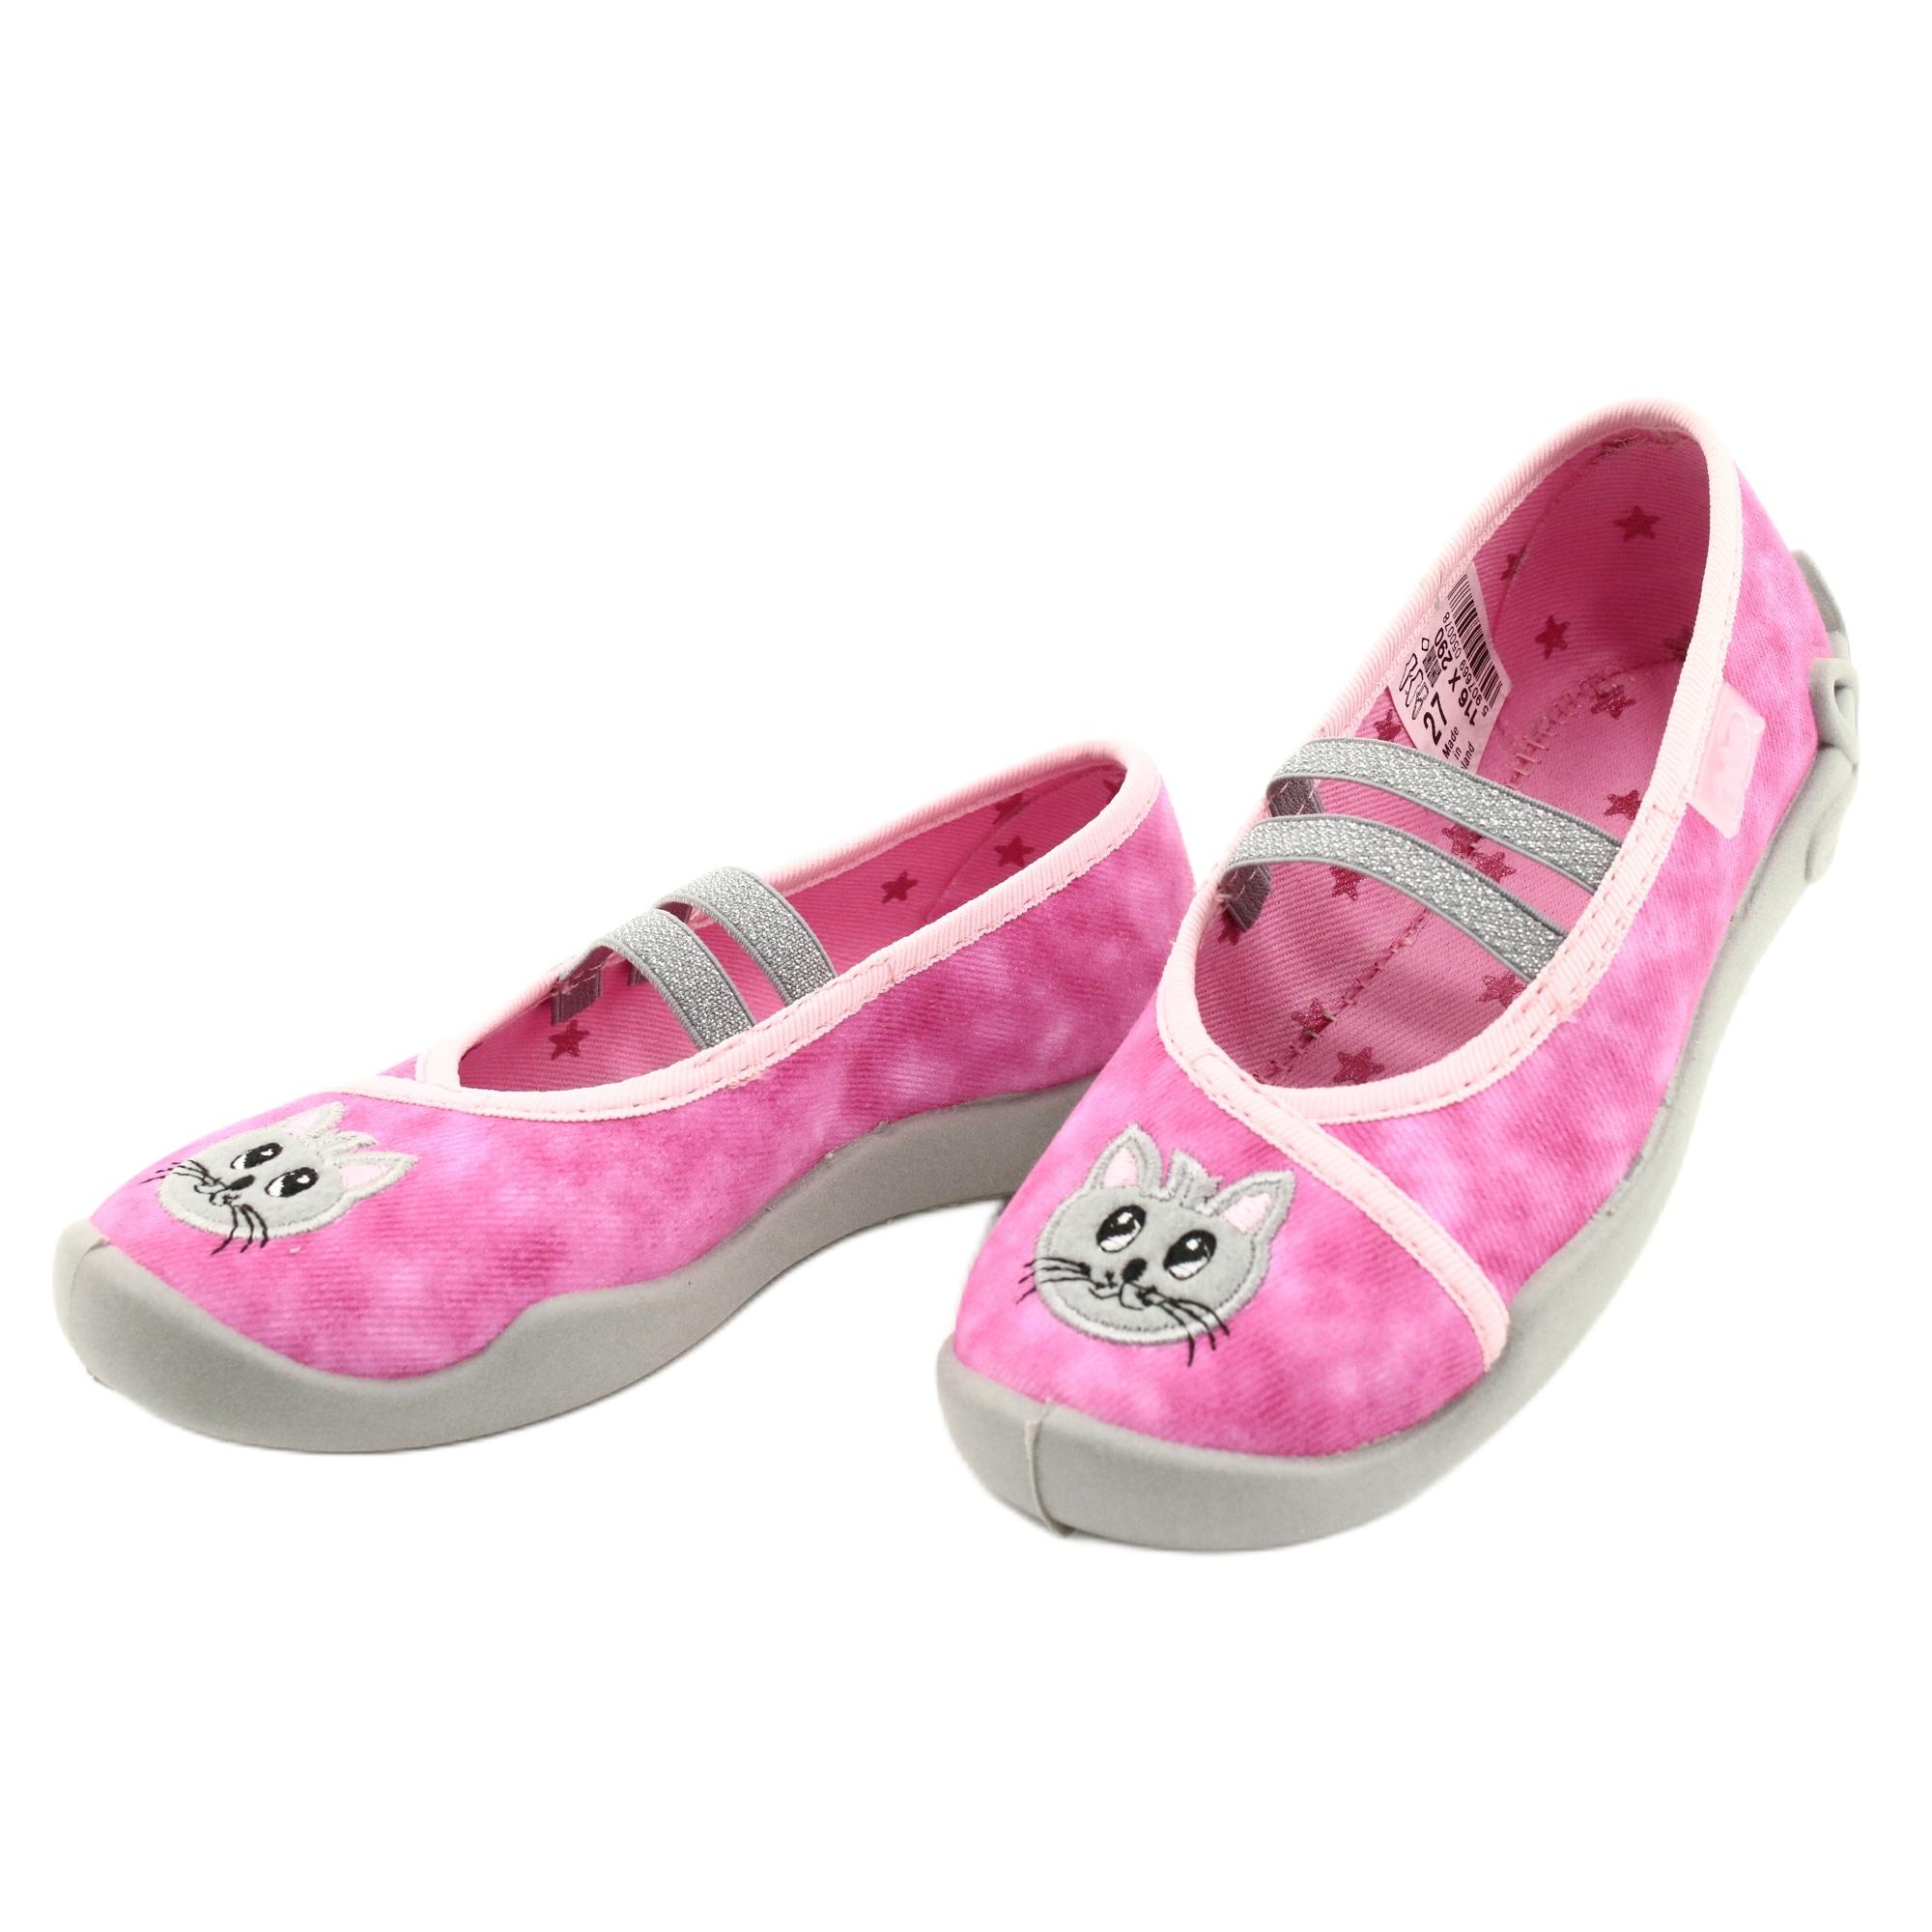 miniatura 4 - Scarpe per bambini Befado 116X290 rosa argento grigio